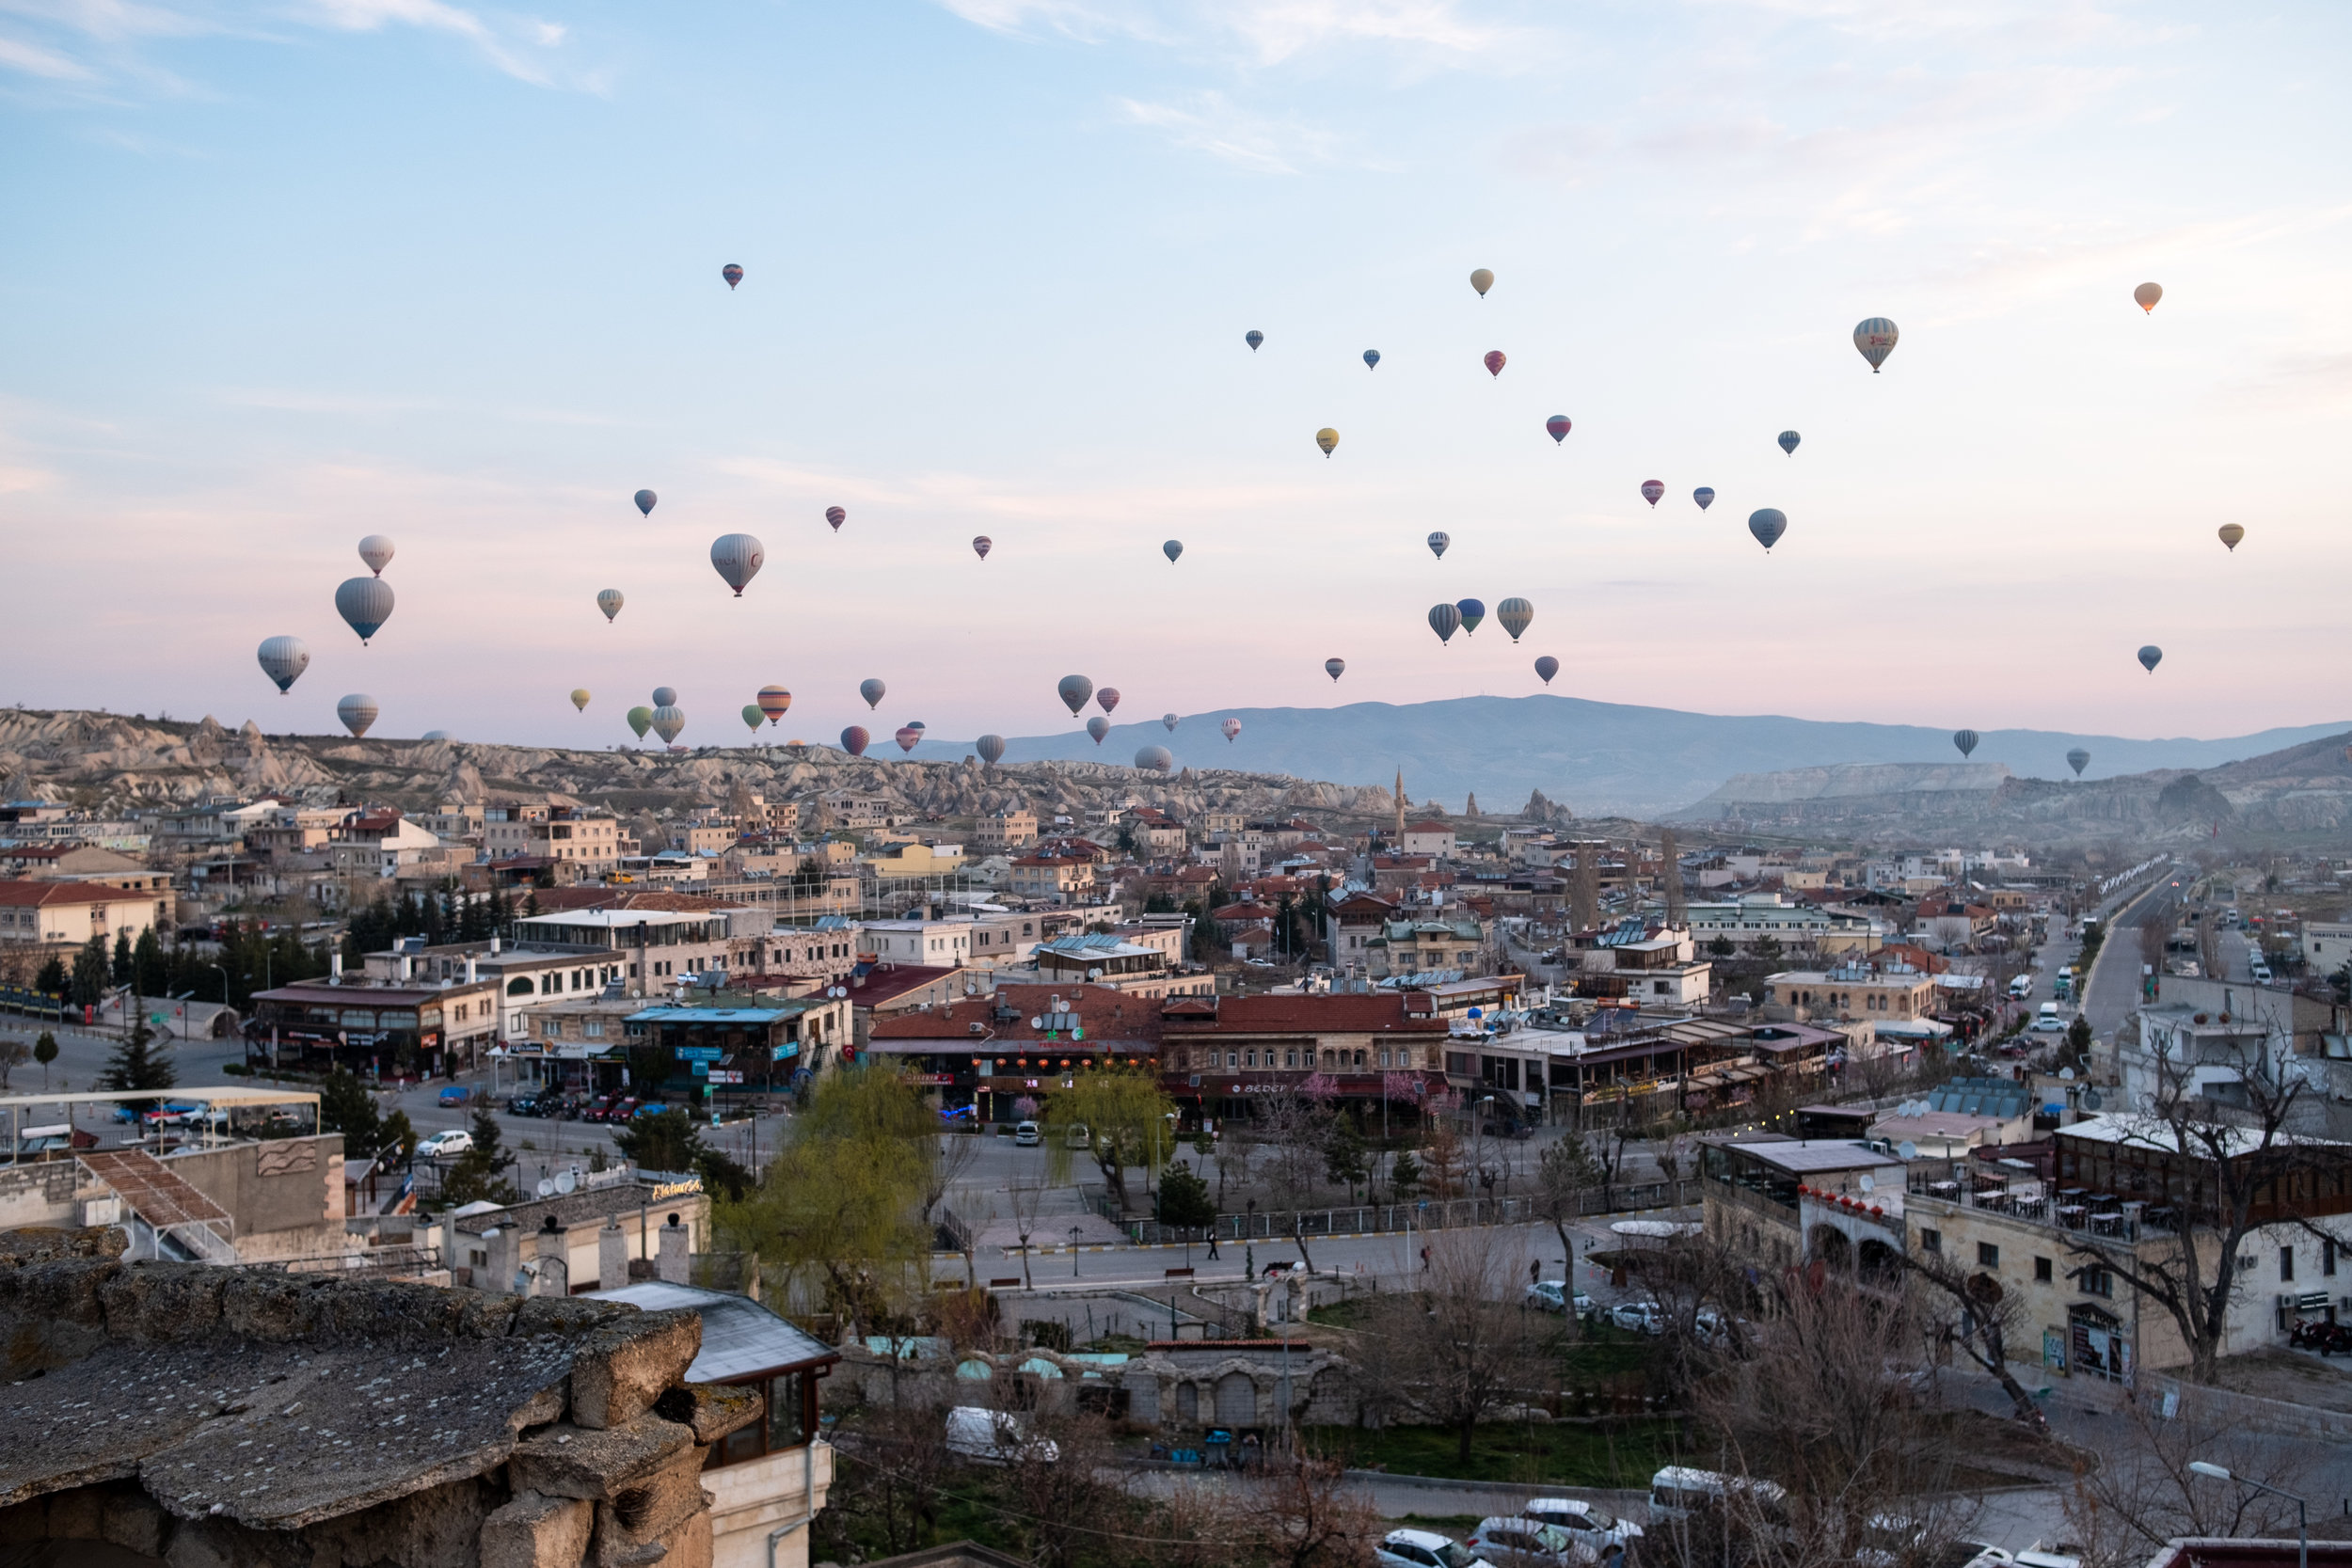 20190405 - Turkey - 0493.JPG